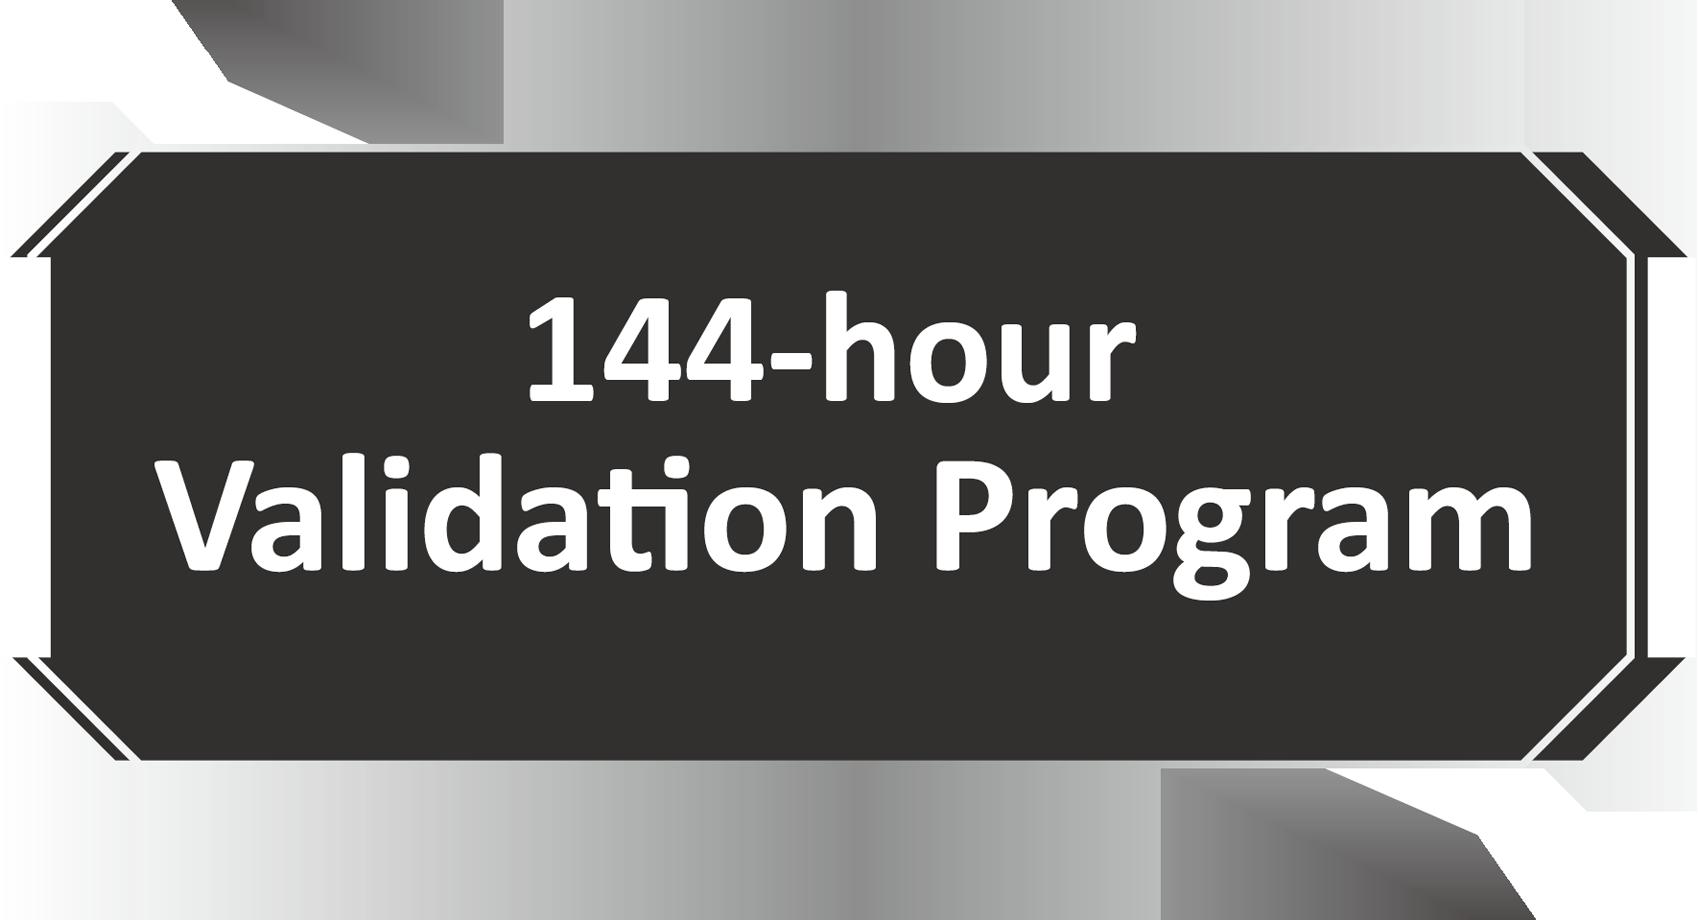 144-hour Validation Program